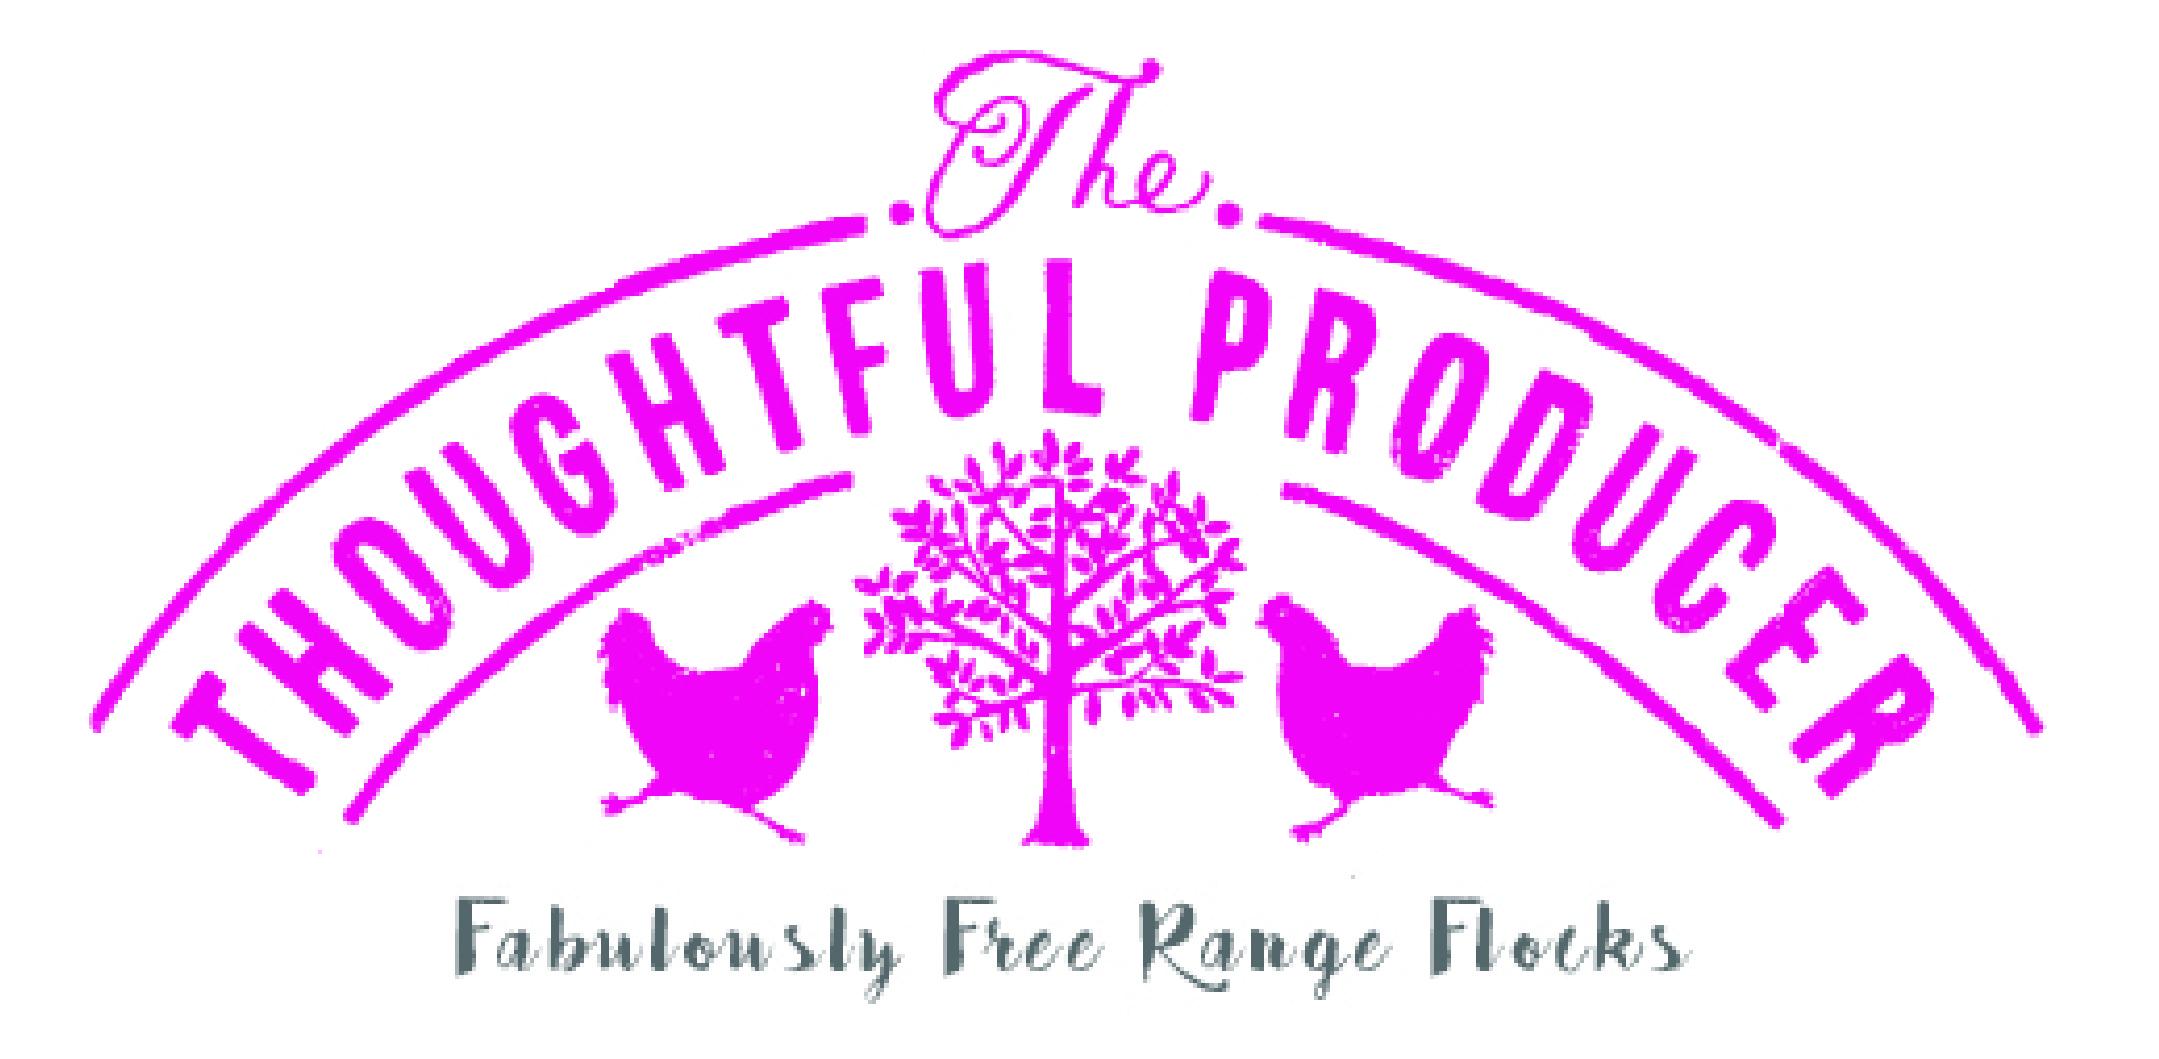 ttp-logo-vector-fabulously-free-range-flock-cropped.jpg